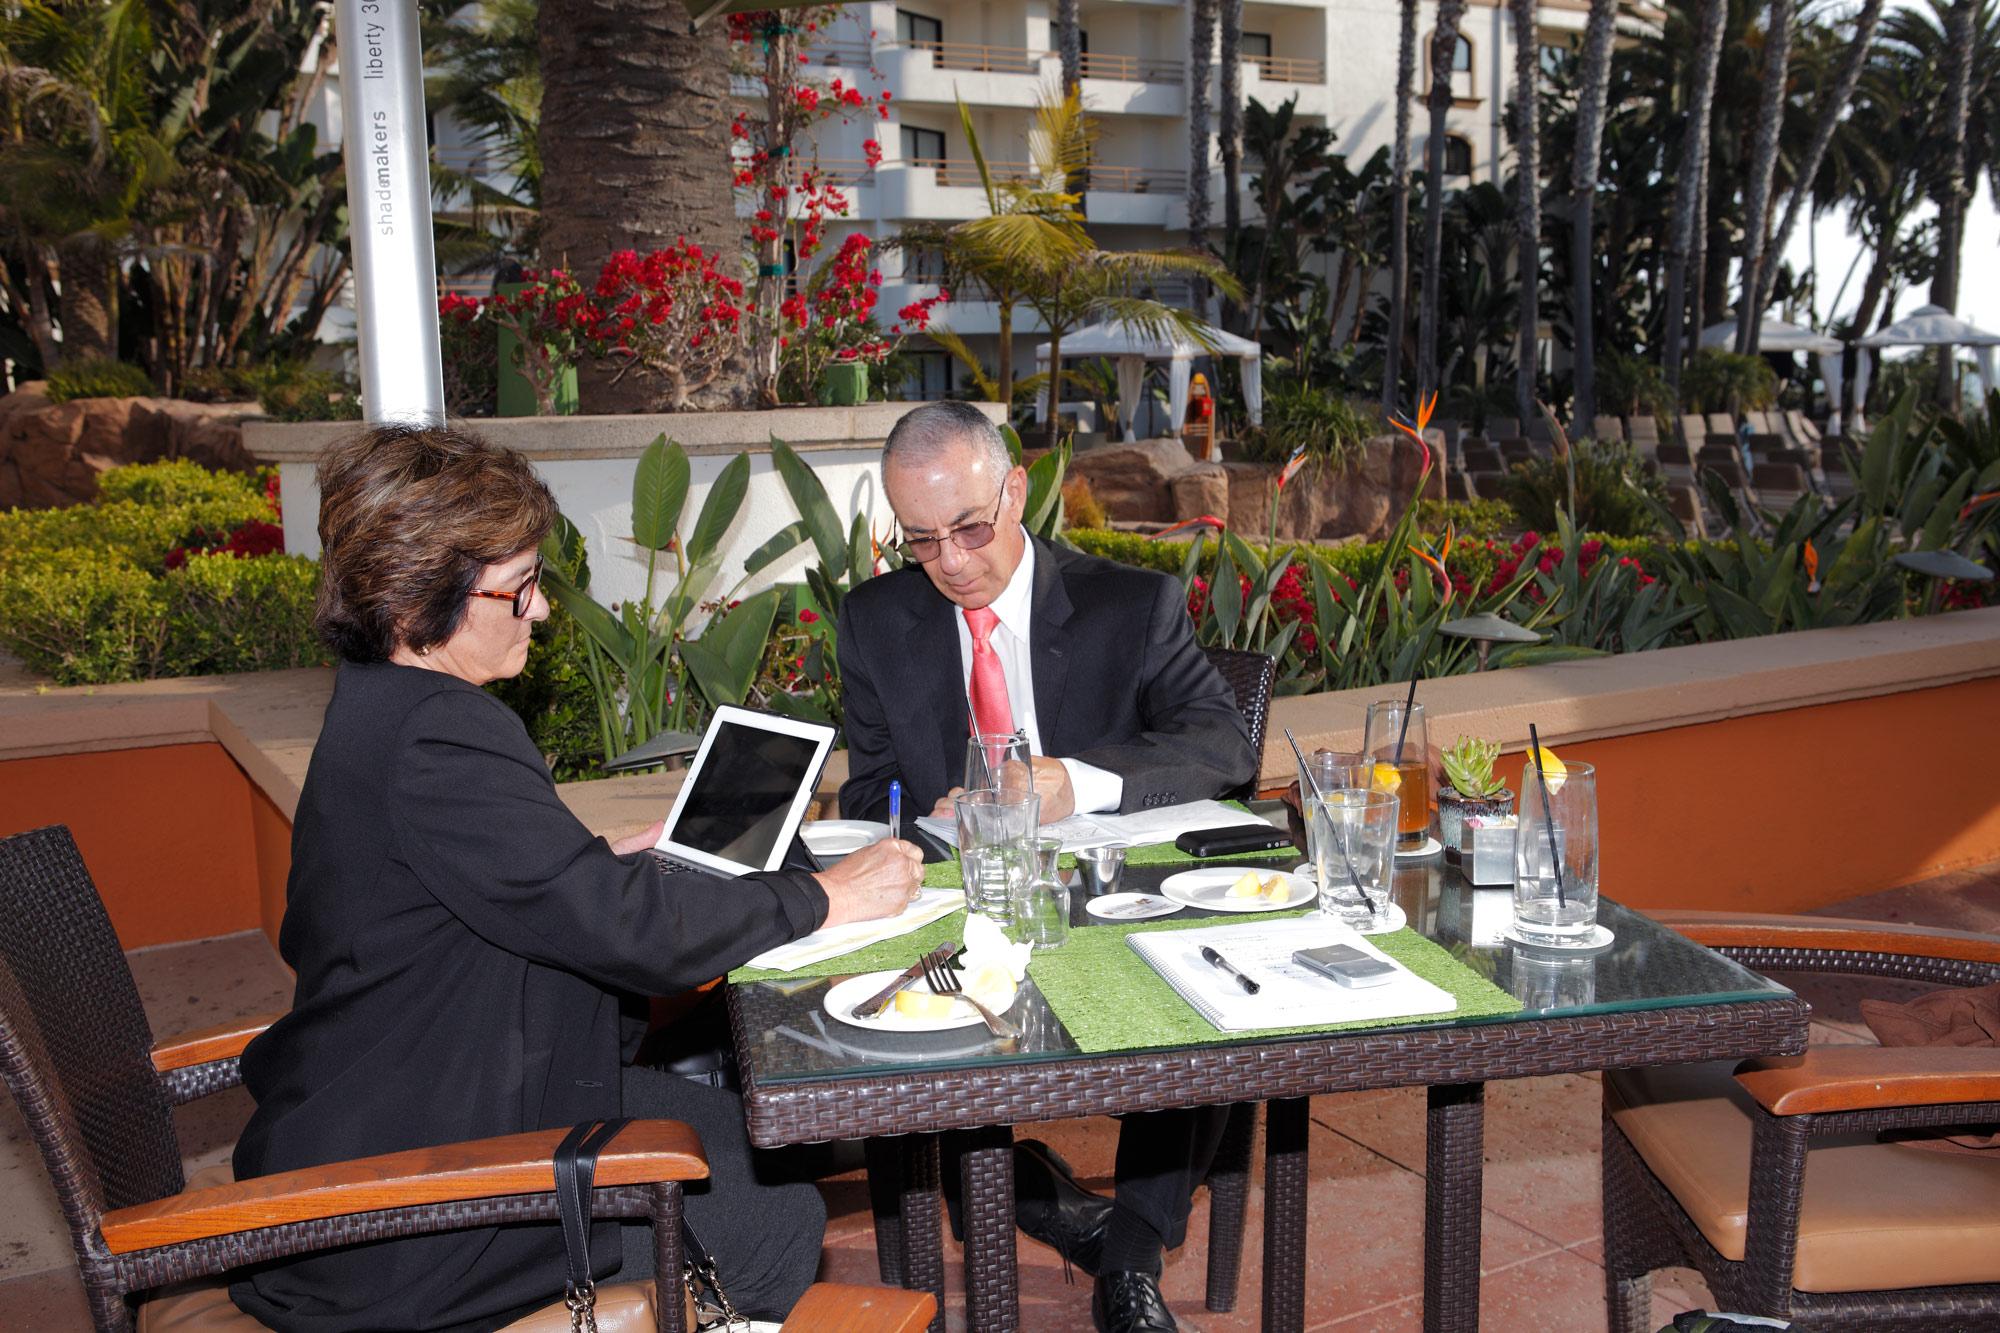 real estate agent services in Santa Barbara